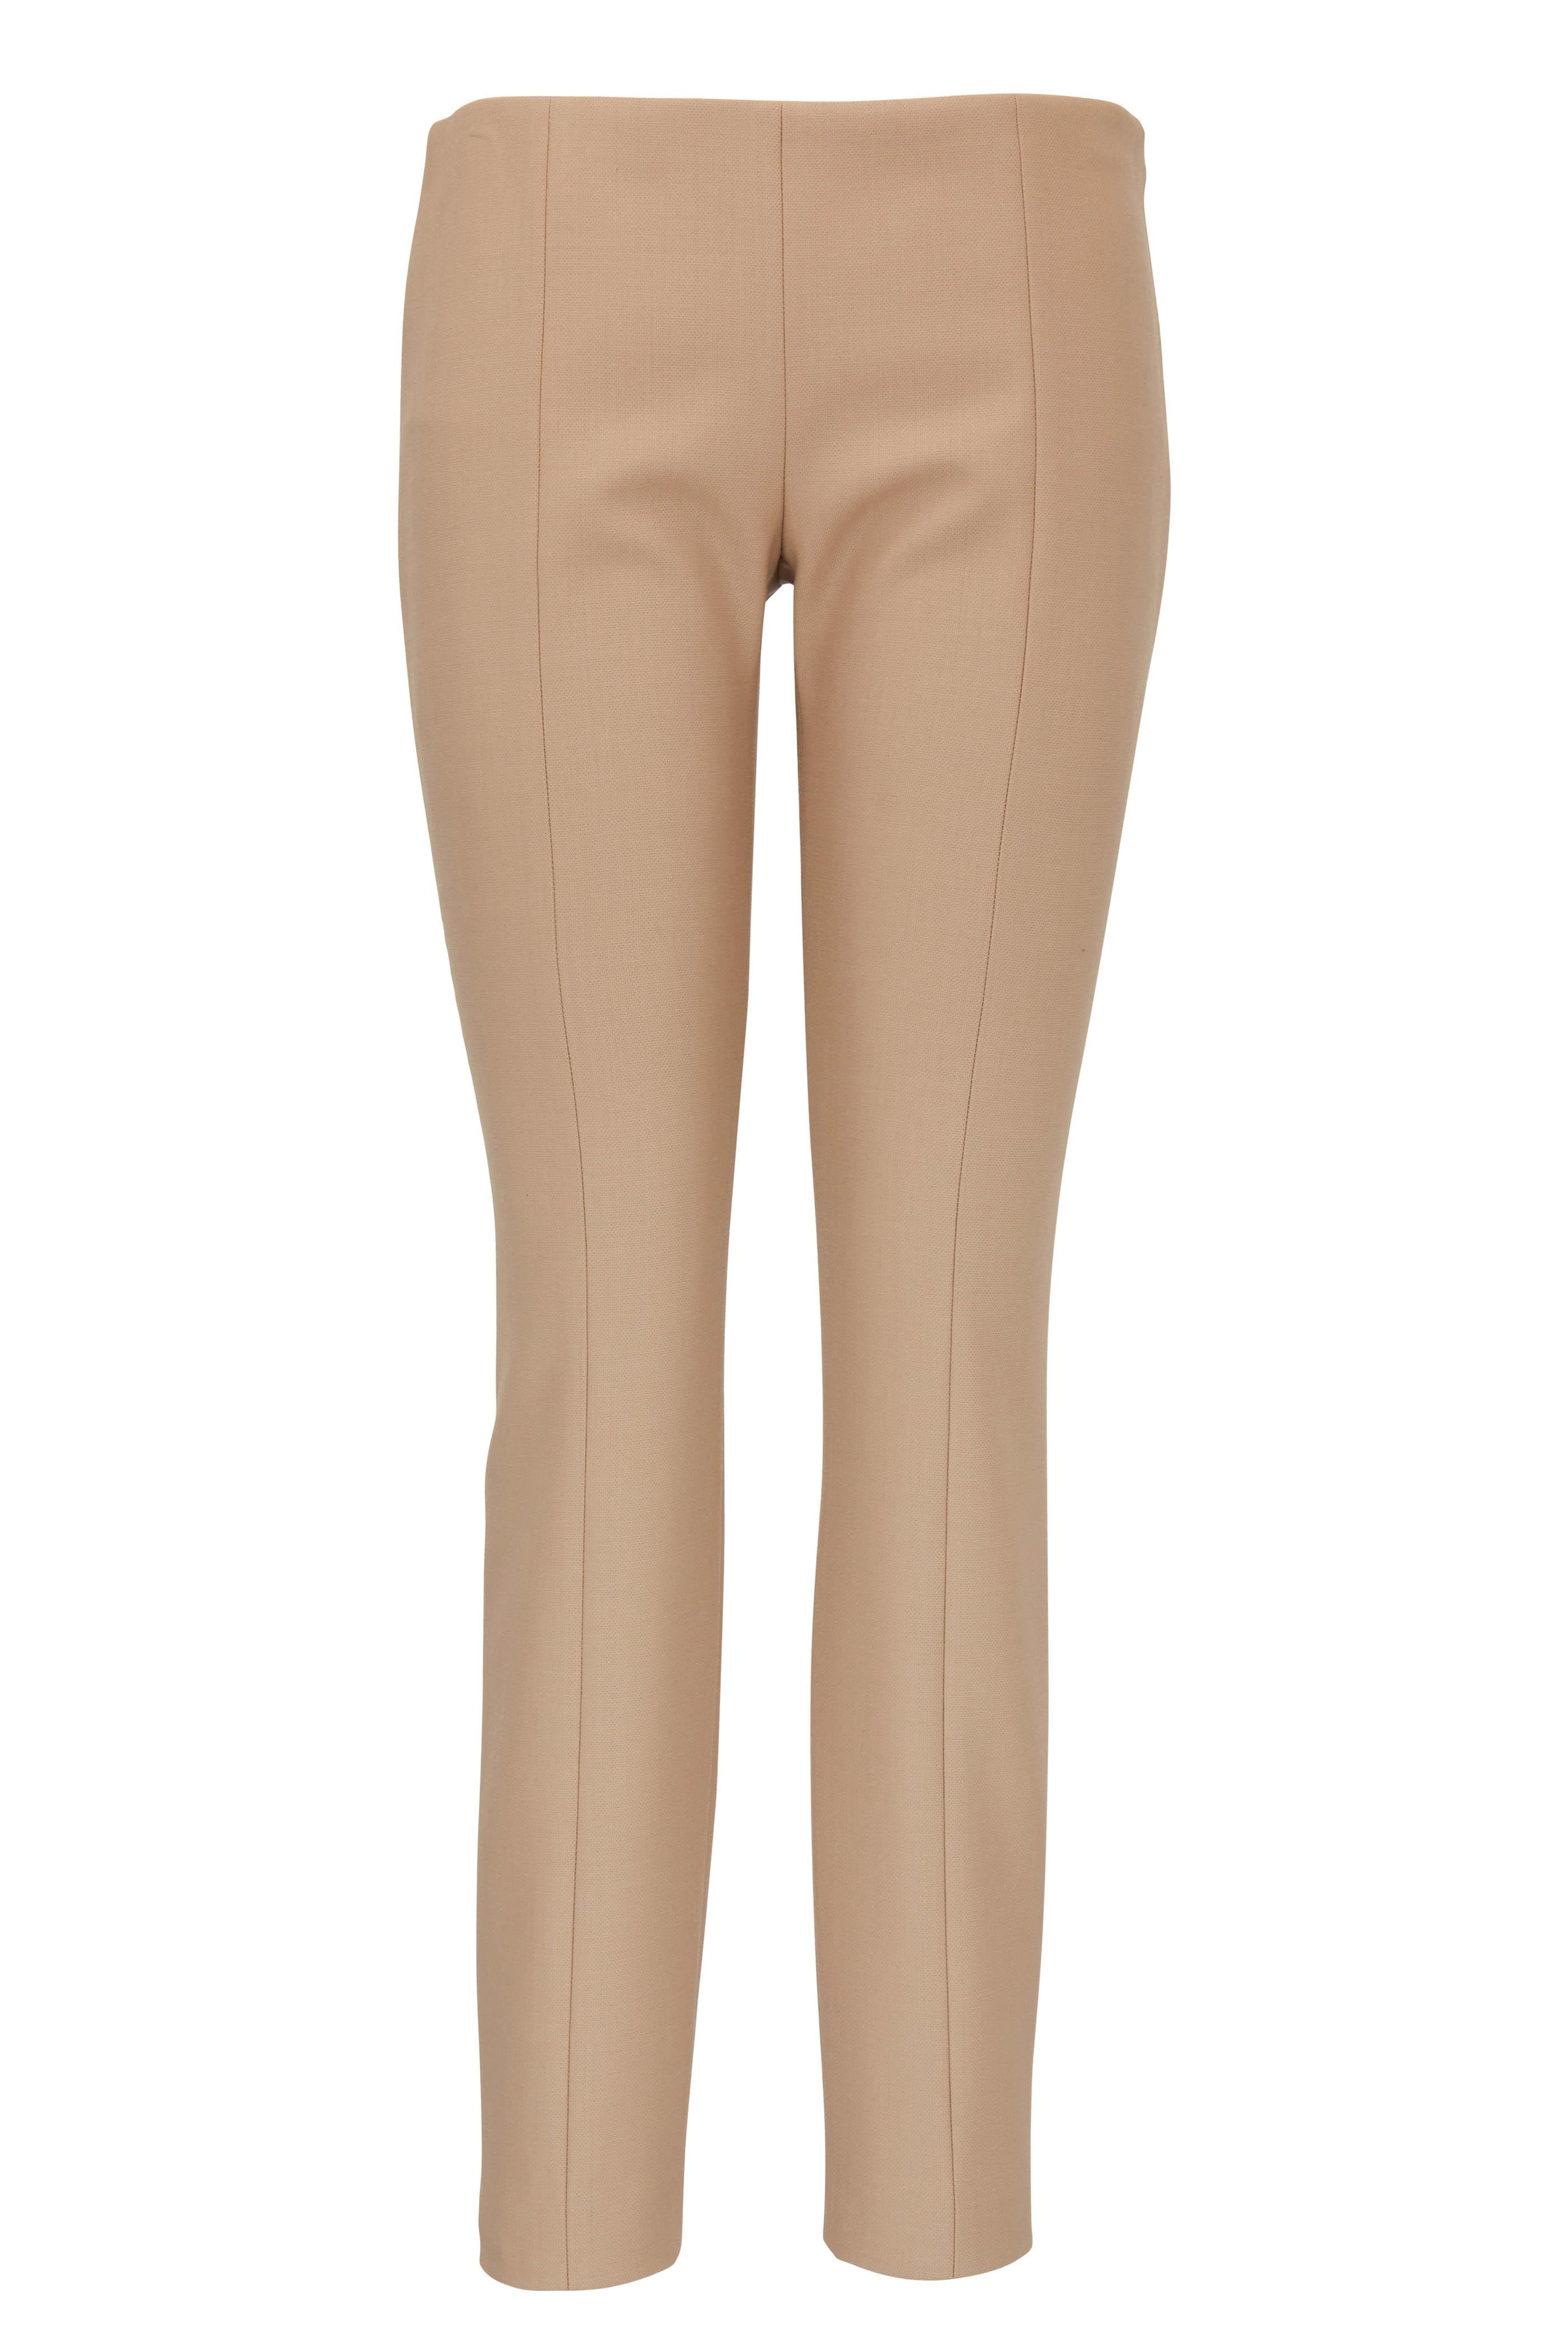 b42245ecb8973 The Row - Kosso Khaki Double Wool Bi-Stretch Legging | Mitchell Stores